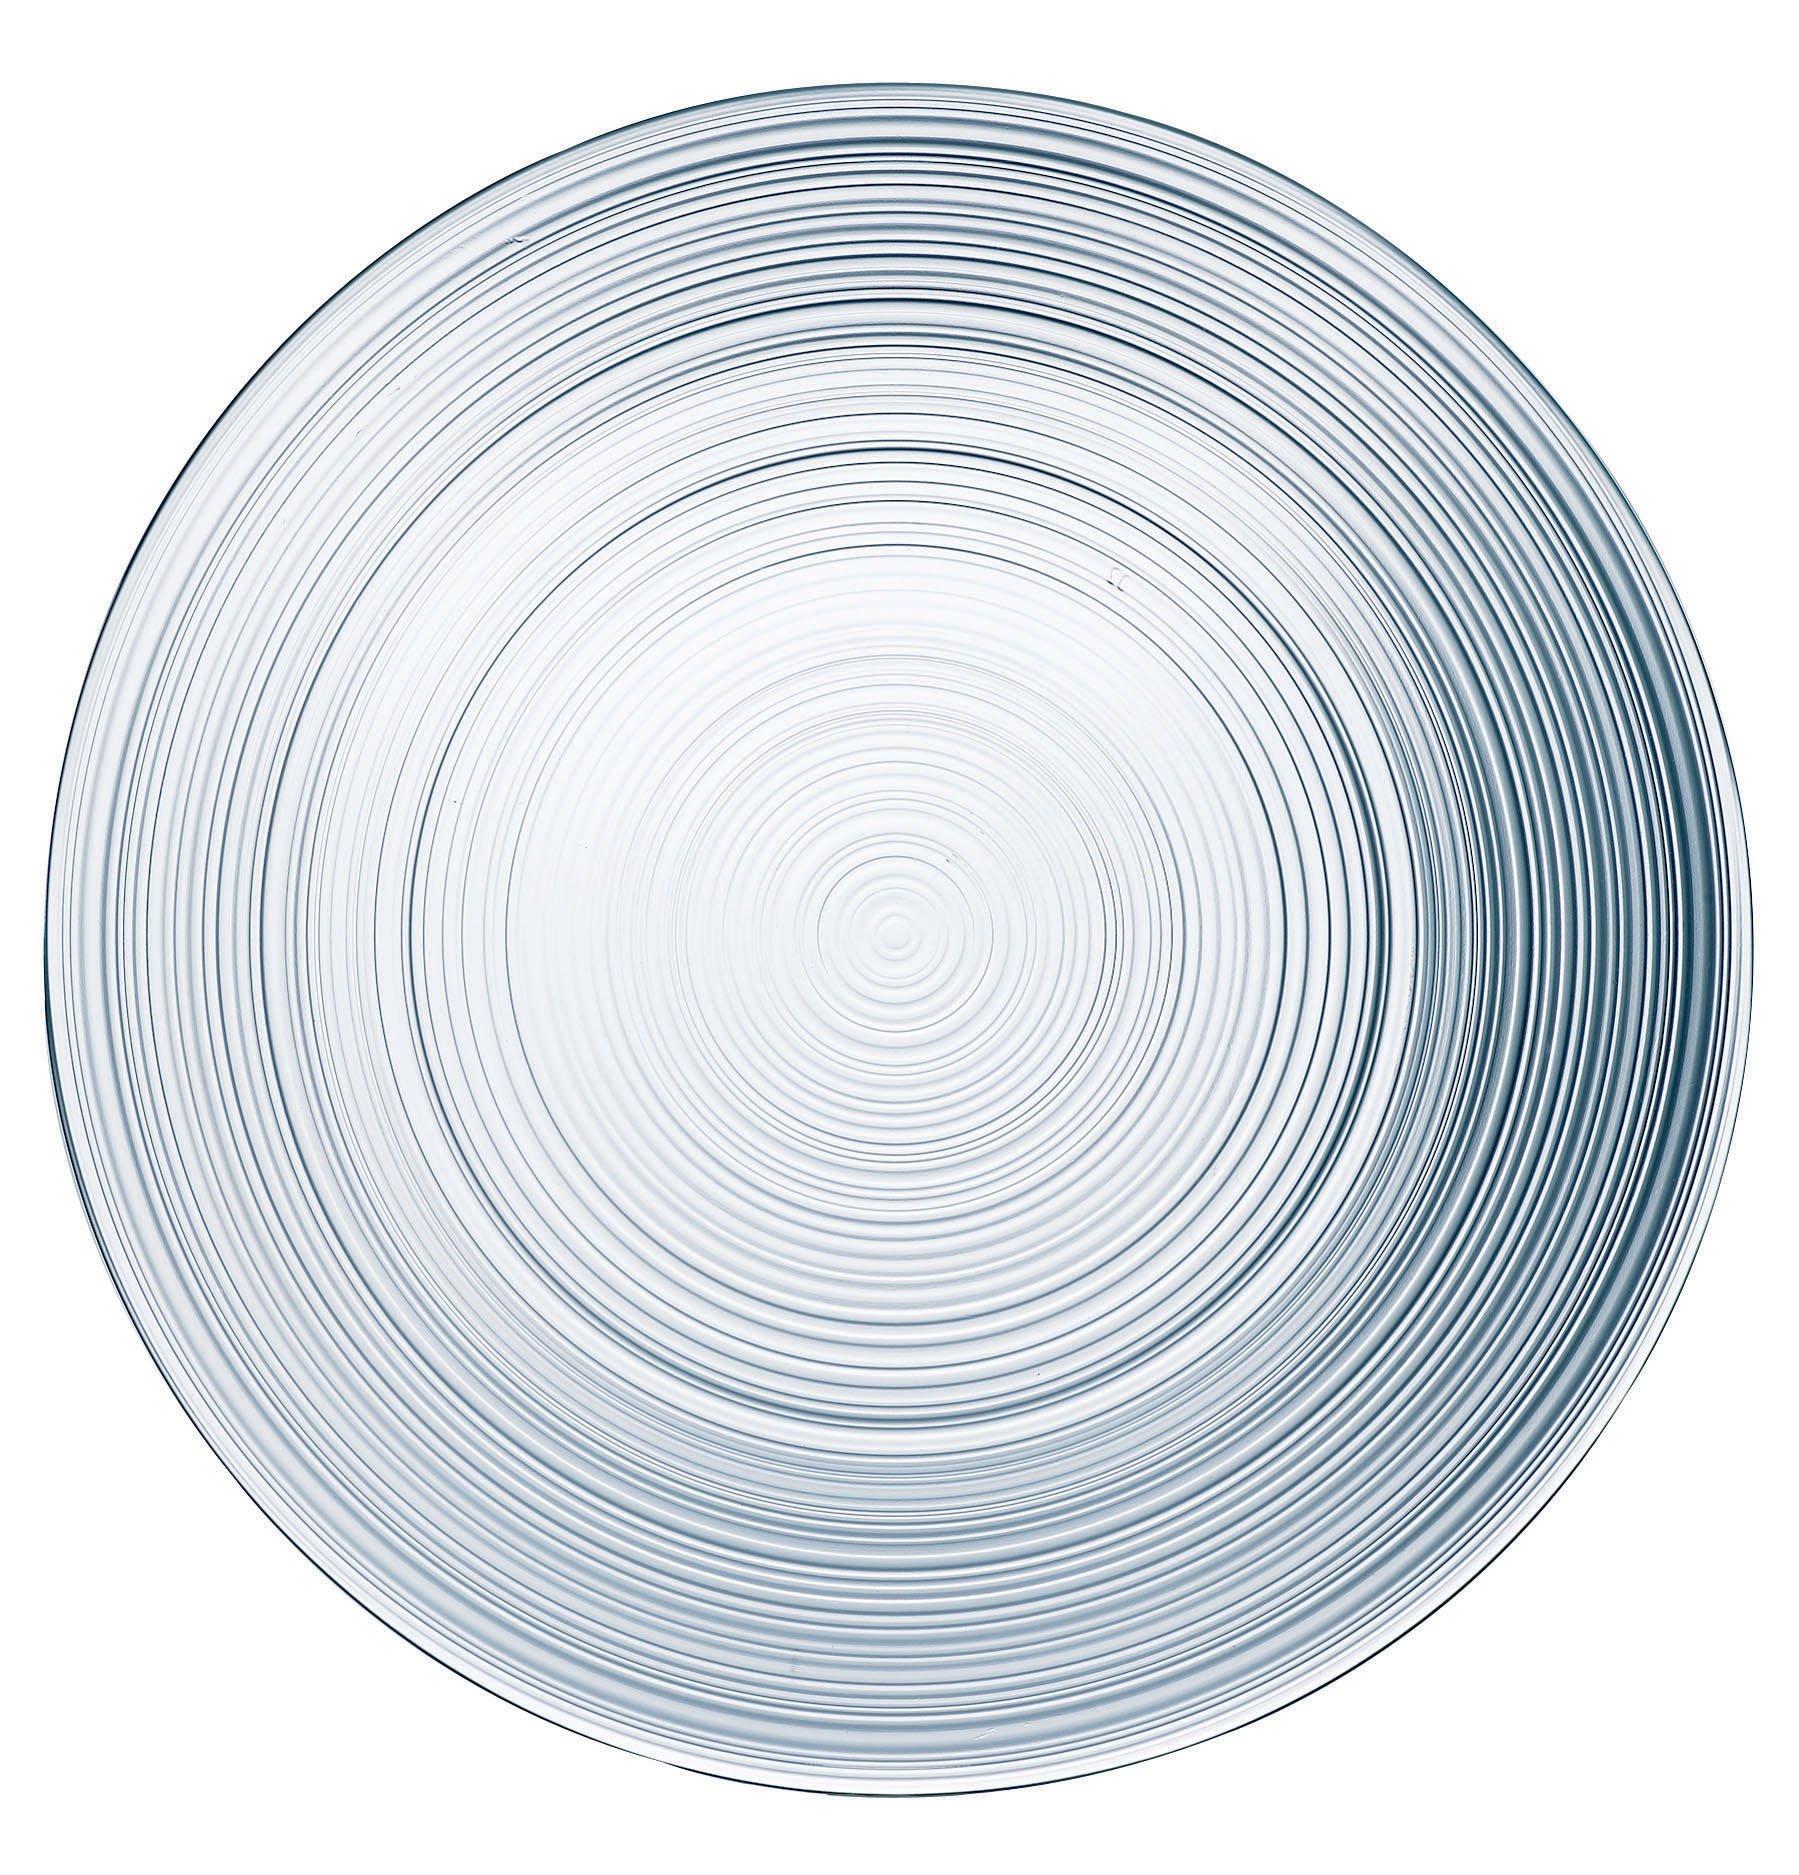 Arc International Santa Fe Dinner Plate, 10.5-Inch, Set of 6